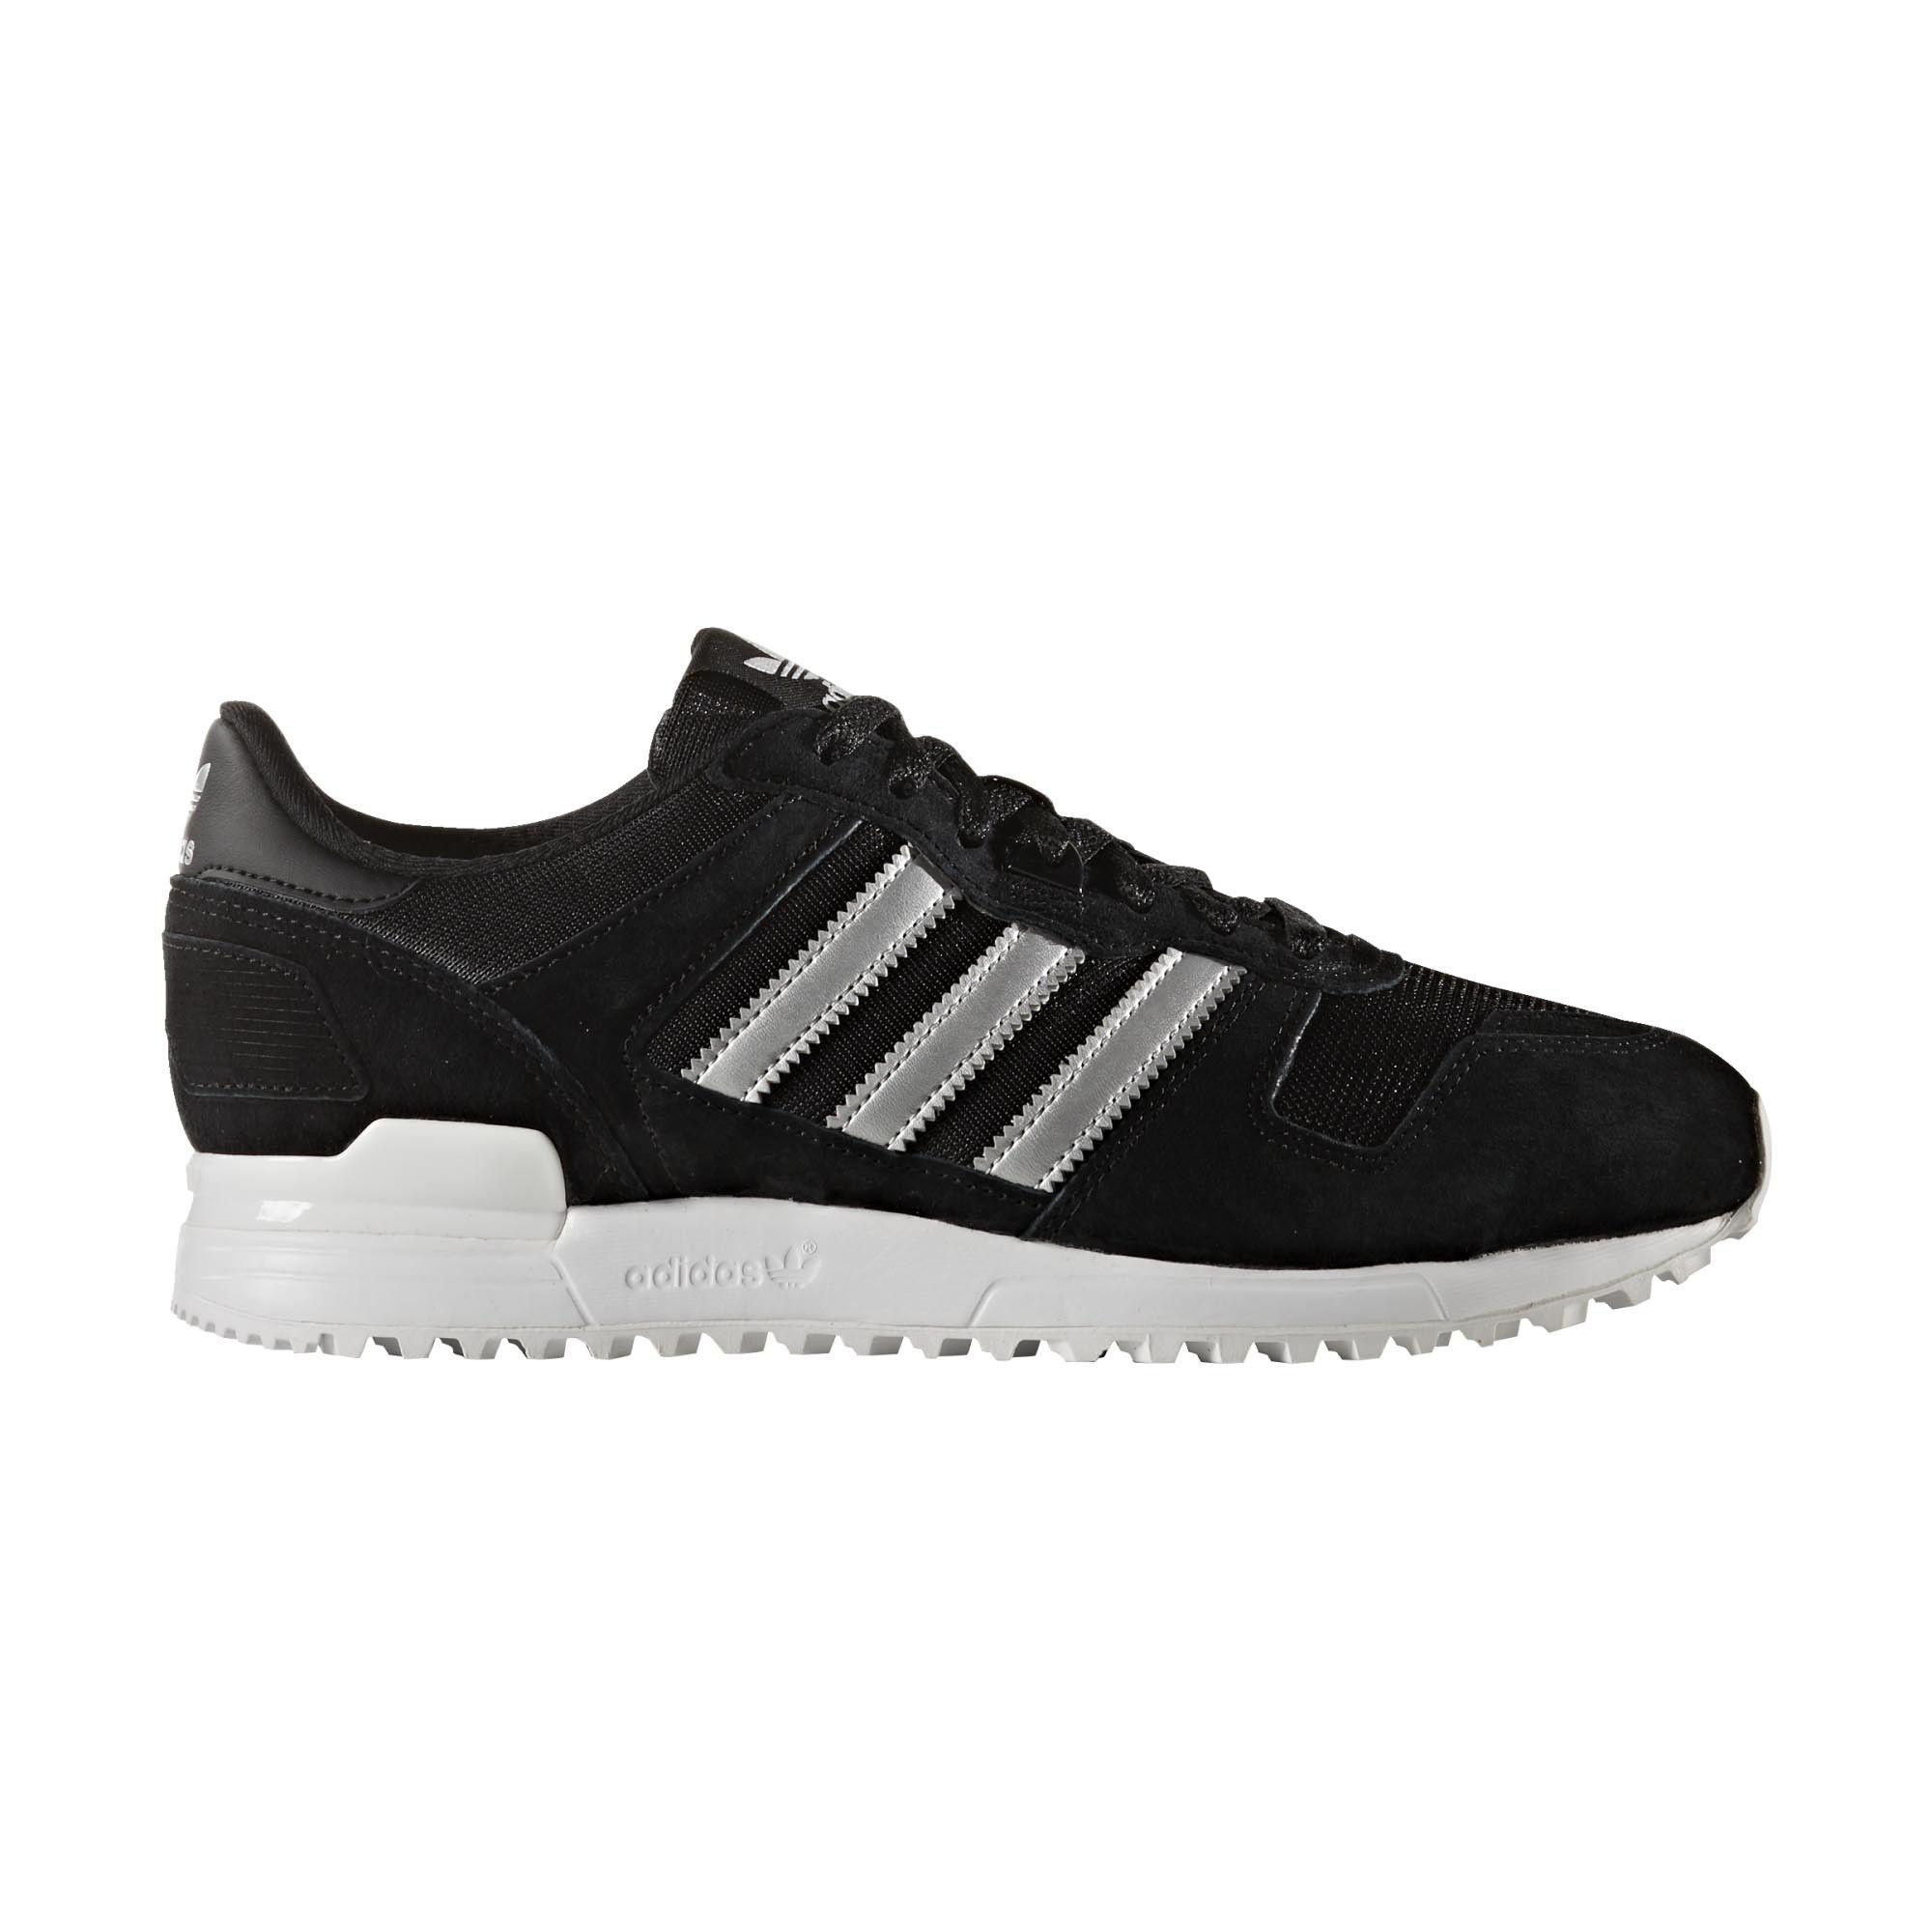 2eeb4bbbc ... new style buty adidas zx 700 bb1215 45 1 3 817f5 cdd28